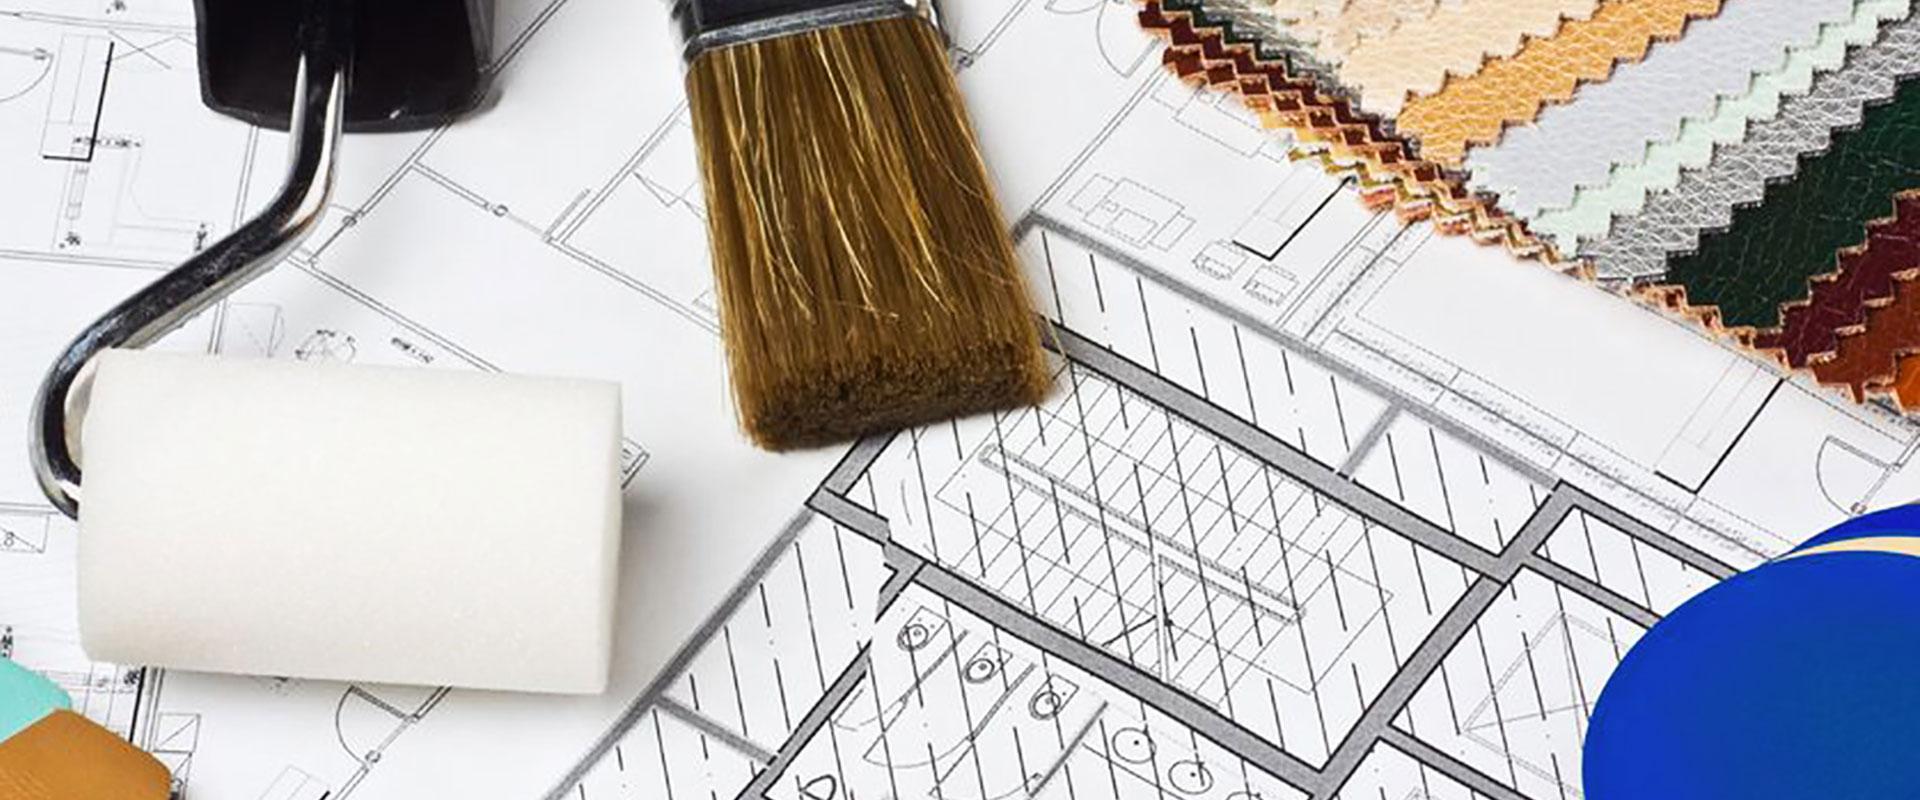 Architettura d'interni di ricci sas